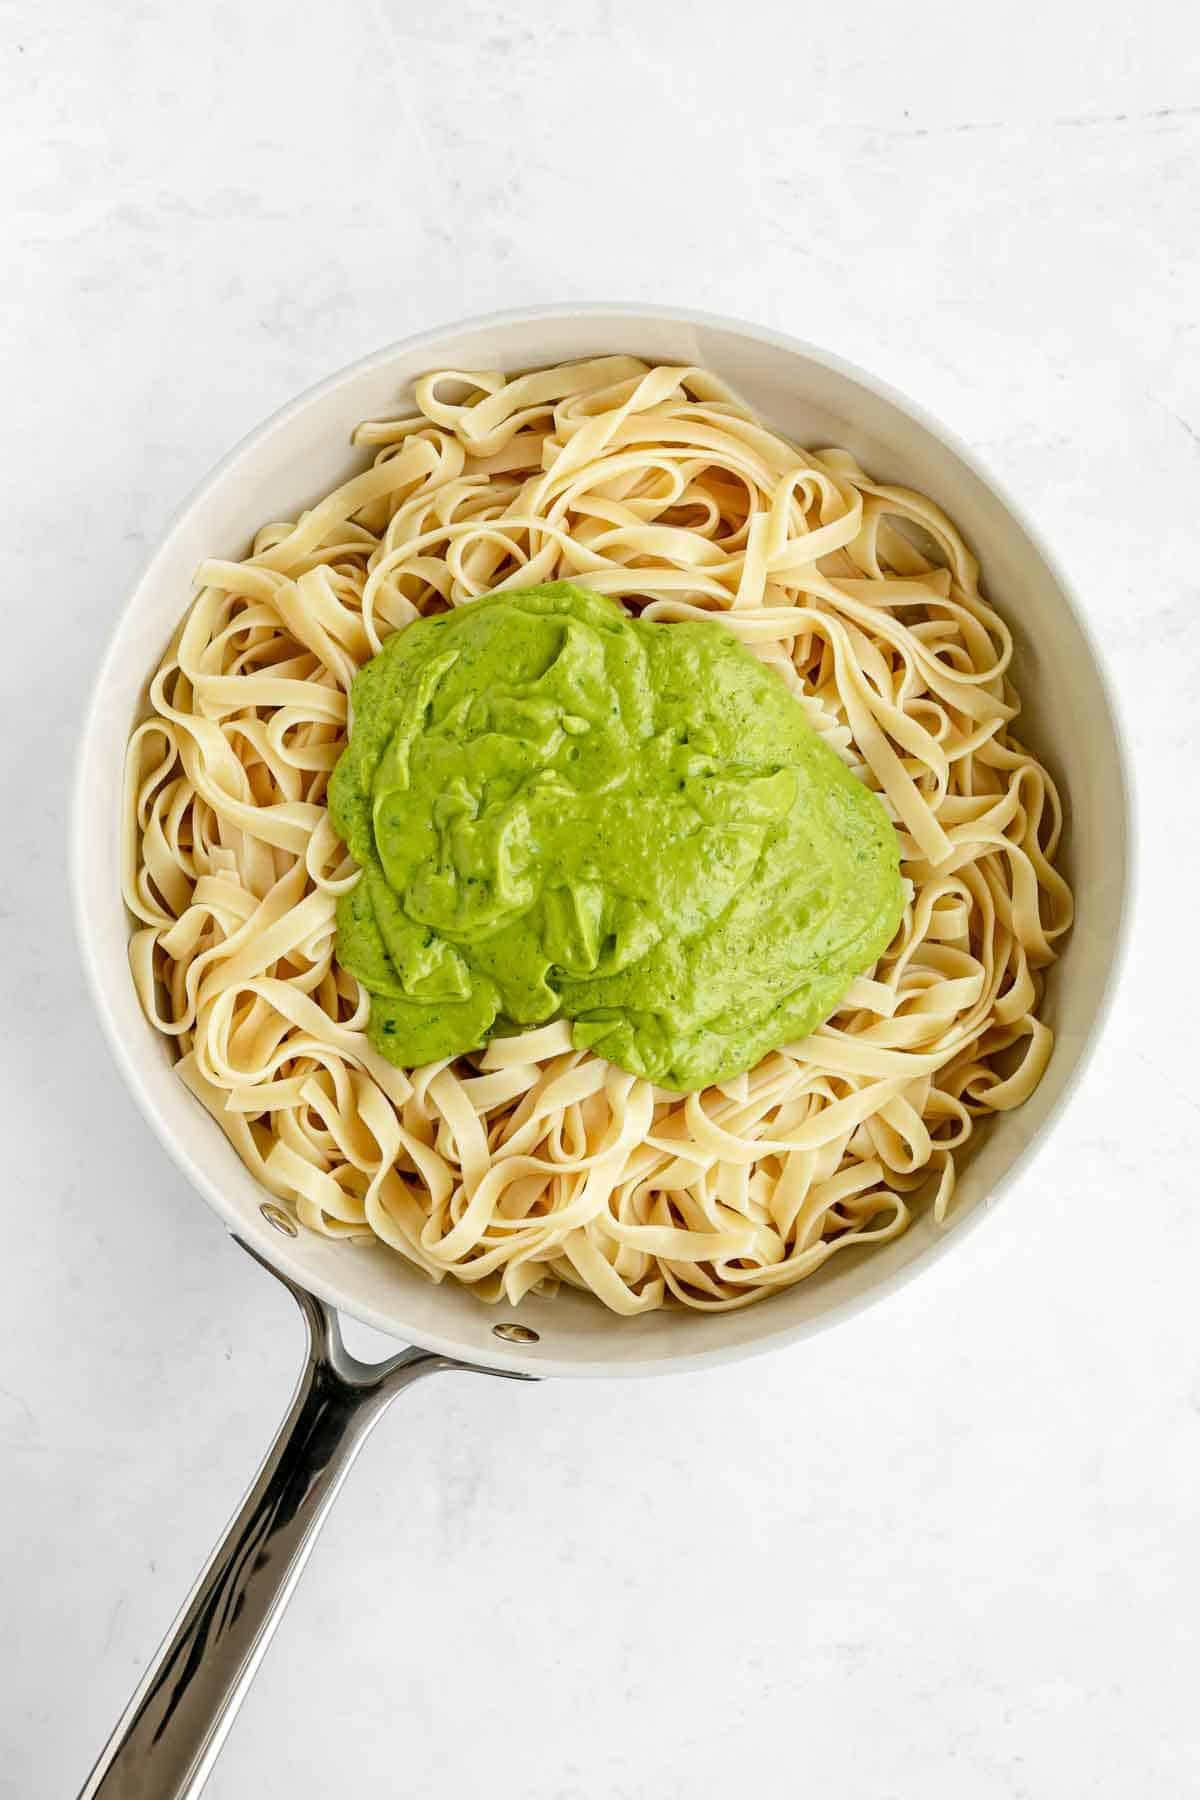 fettuccine pasta in a pot with avocado pesto sauce on top